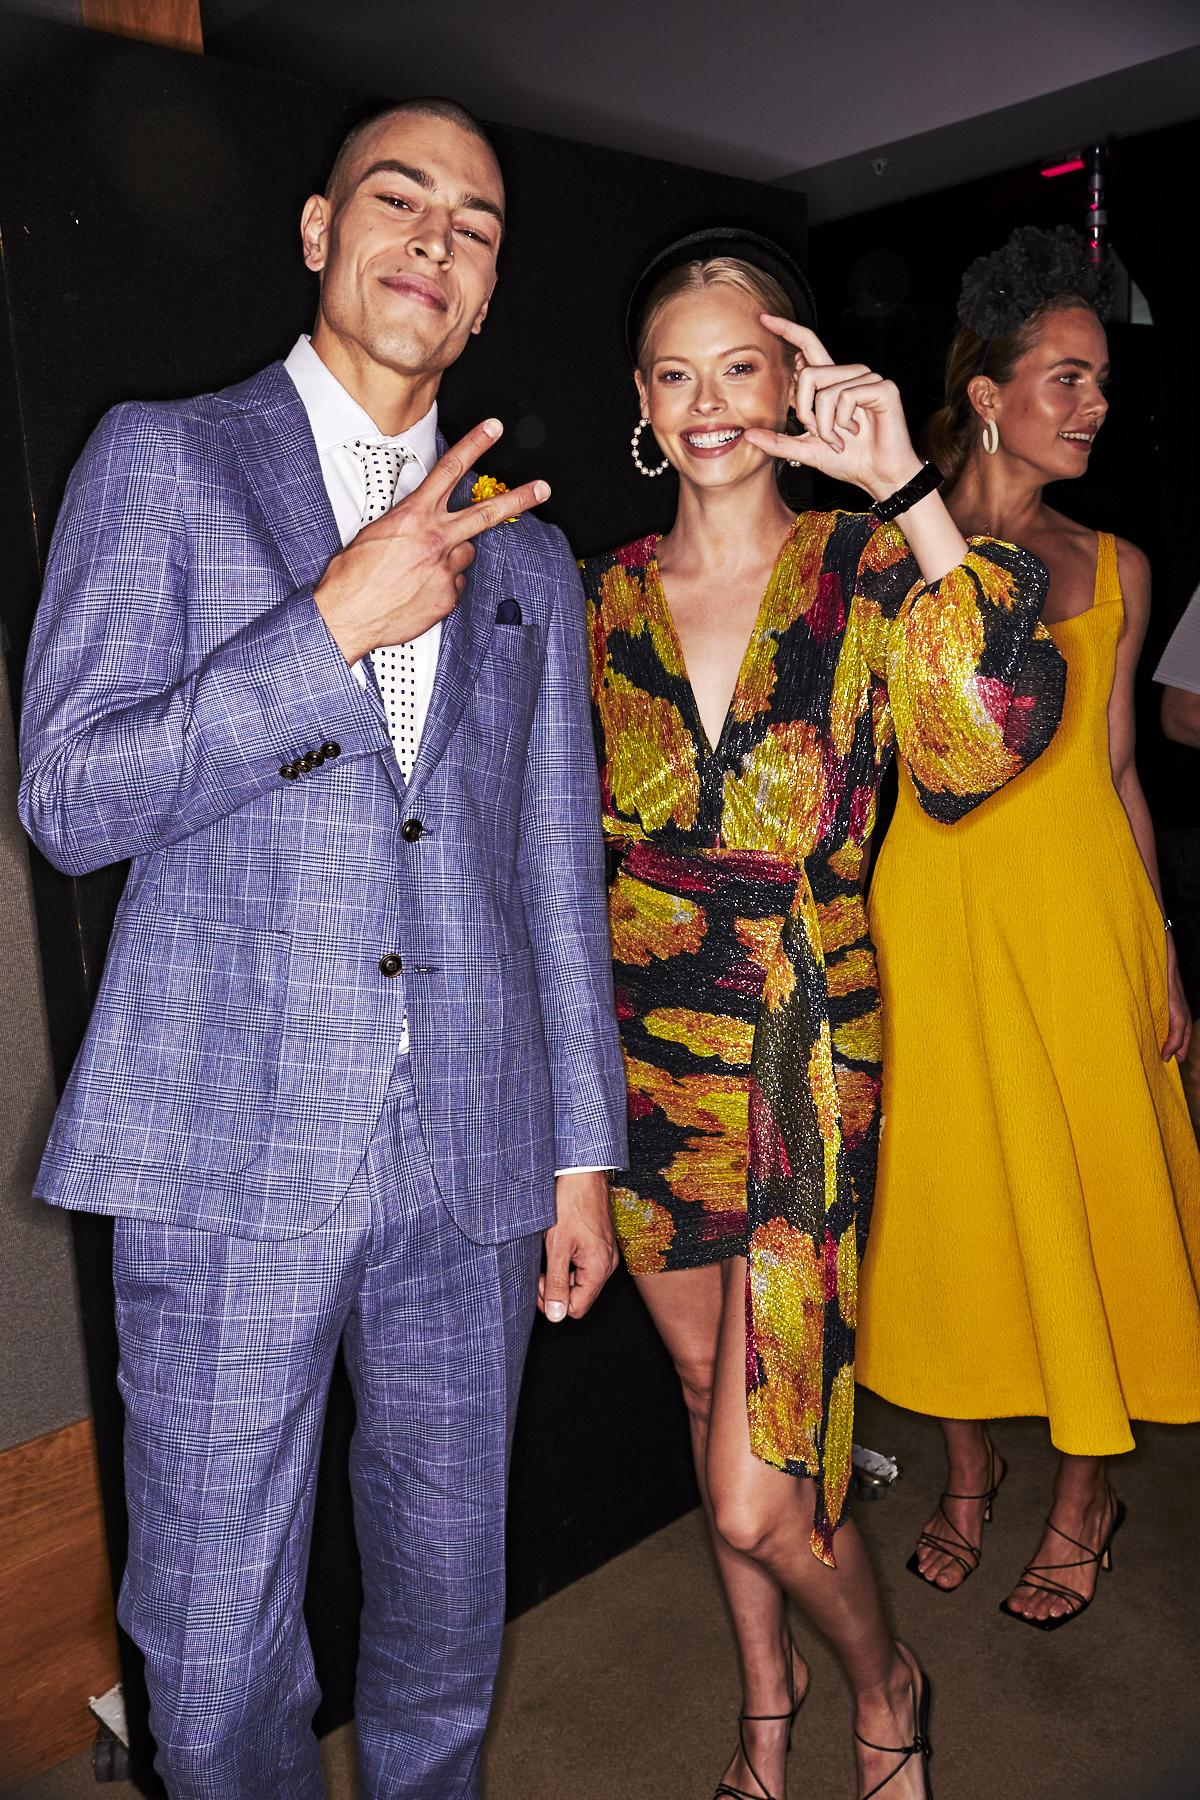 Vogue Mini Fashion at the Australian Turf Club Everest Event